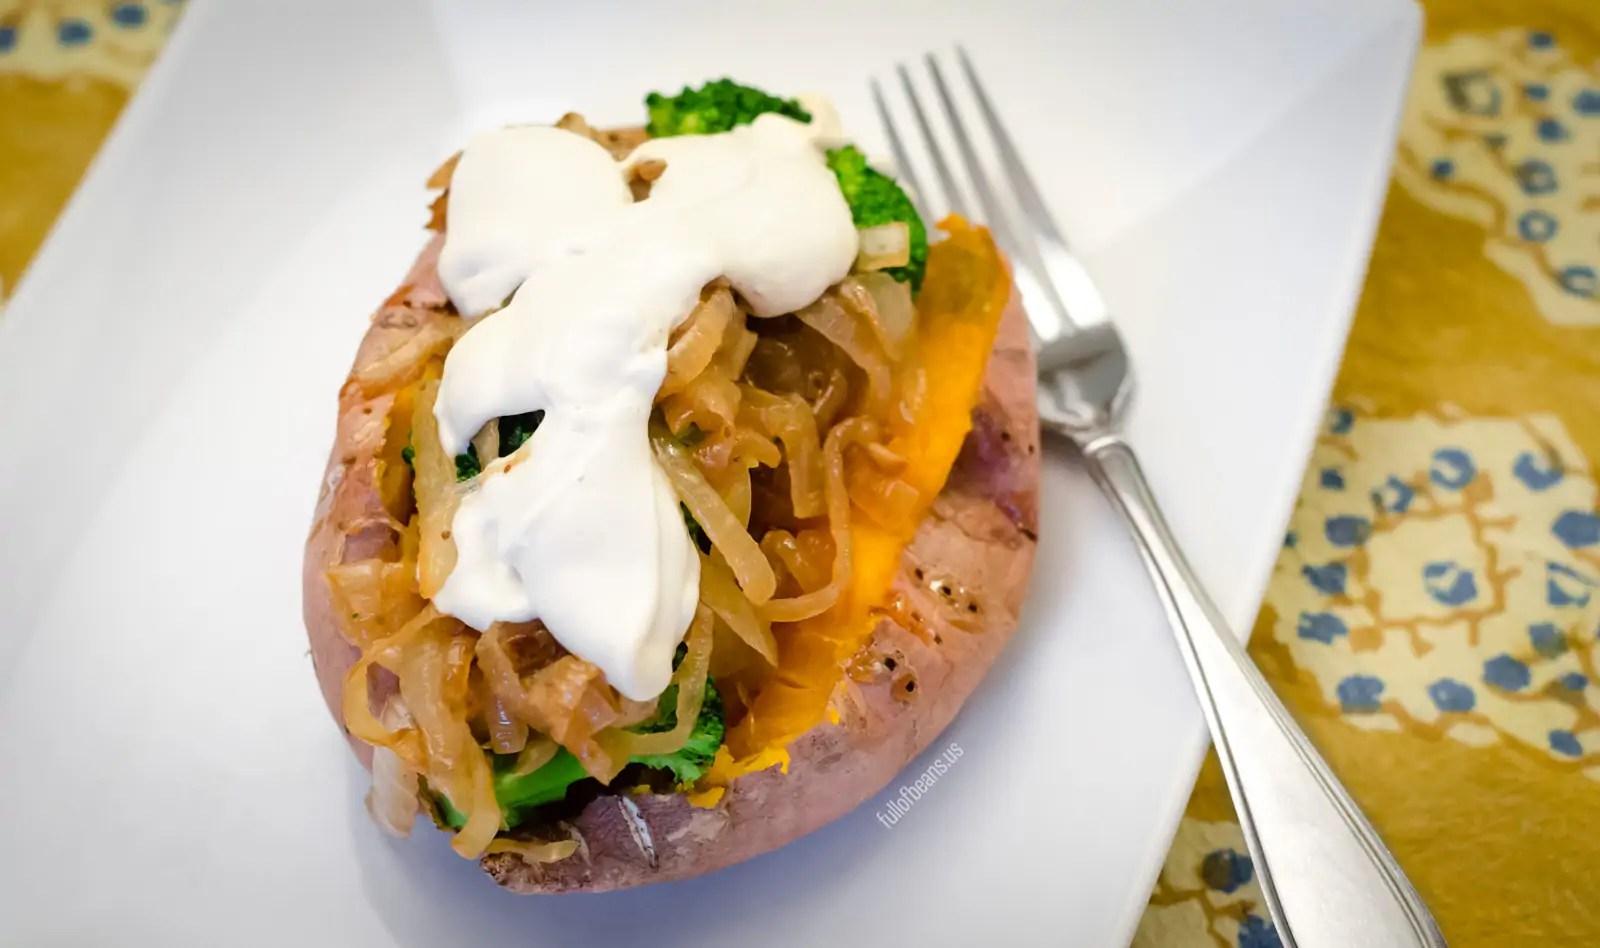 Caramelized Onion And Broccoli Stuffed Sweet Potatoes